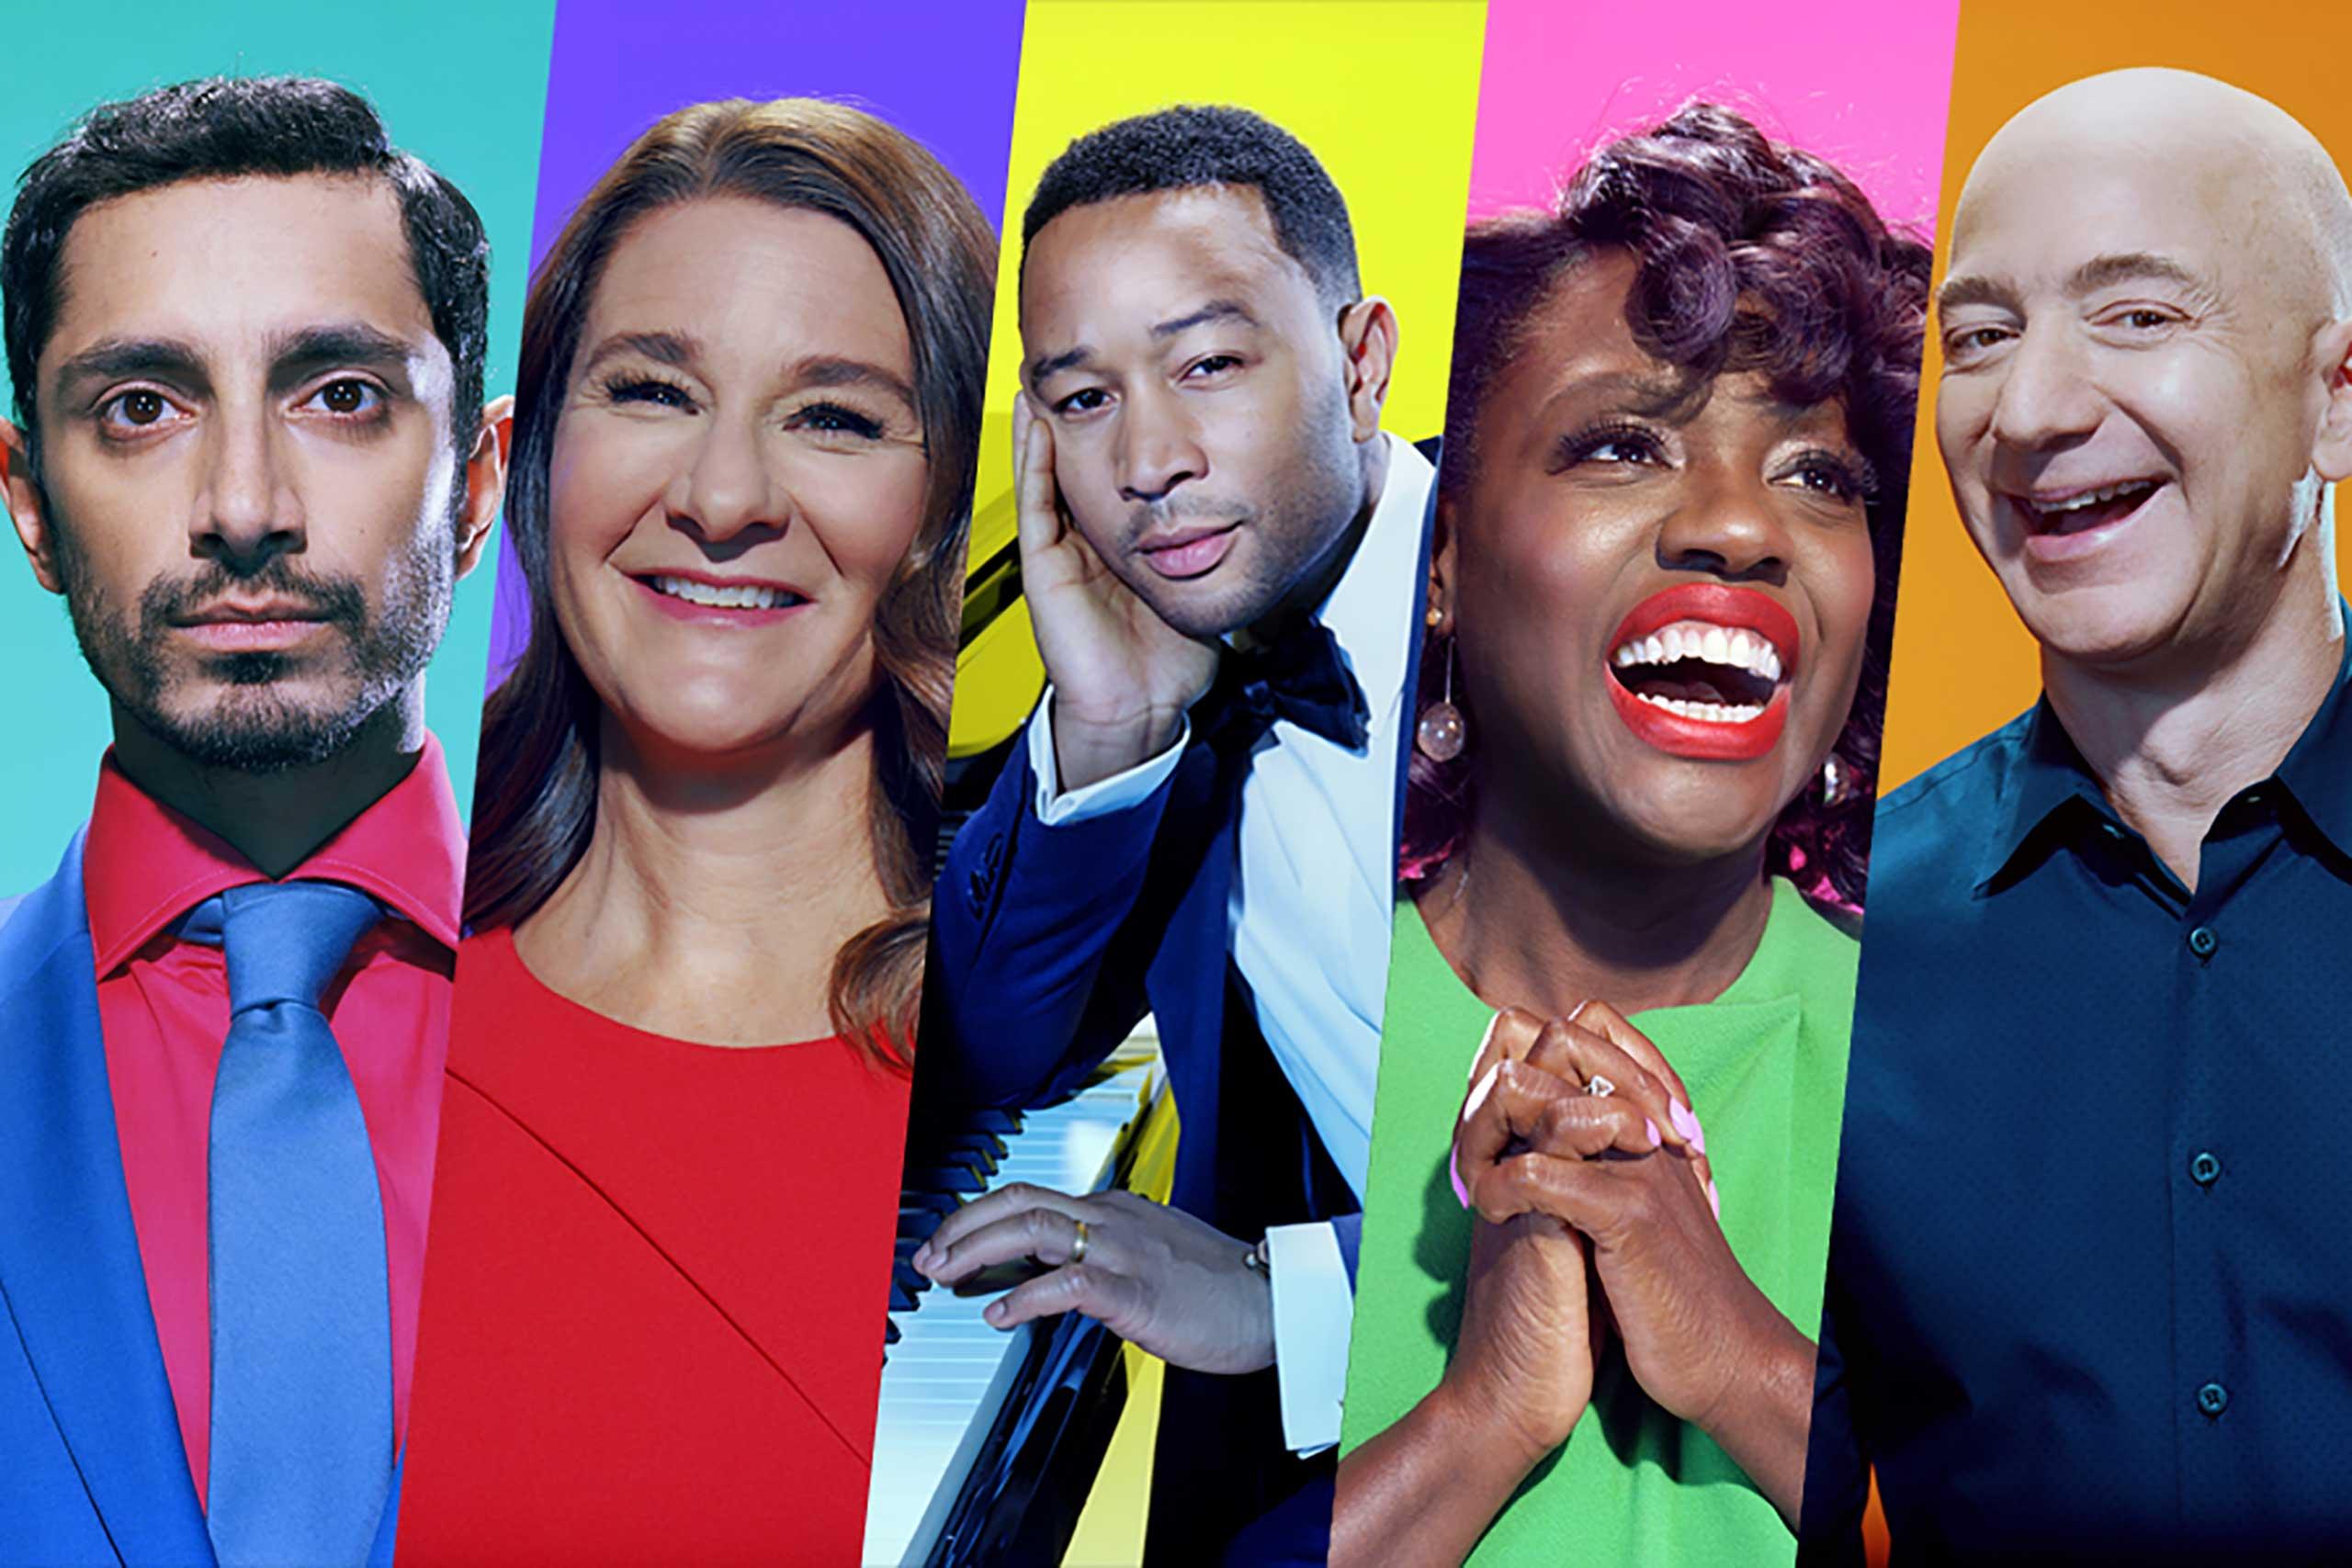 (L-R) Riz Ahmed, Melinda Gates, John Legend, Viola Davis, Jeff Bezos.